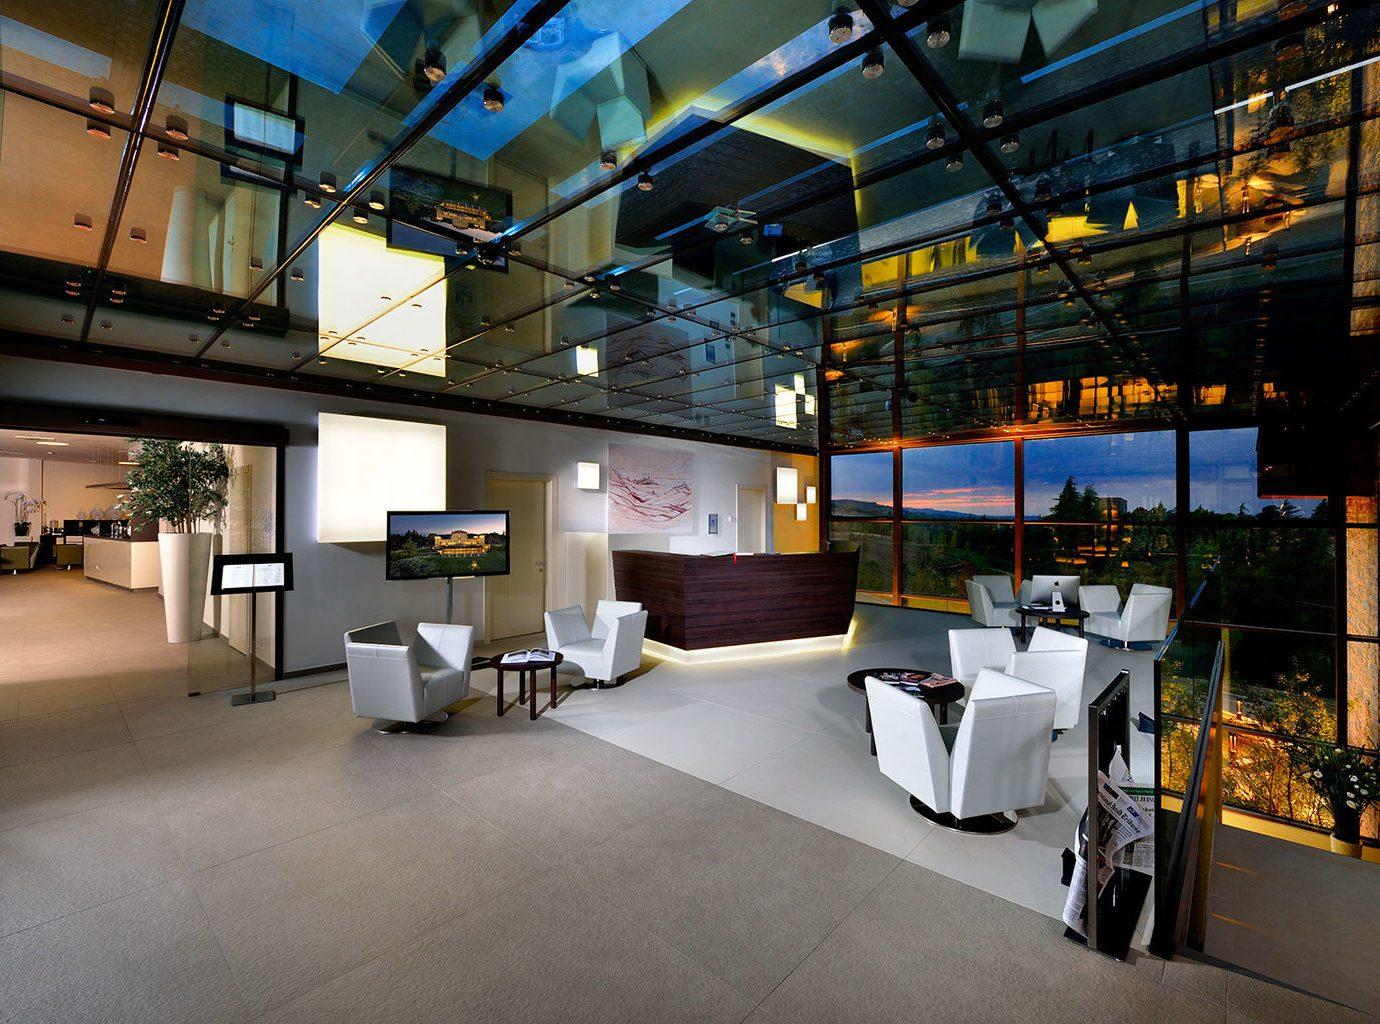 Lobby Luxury Modern building Architecture tourist attraction